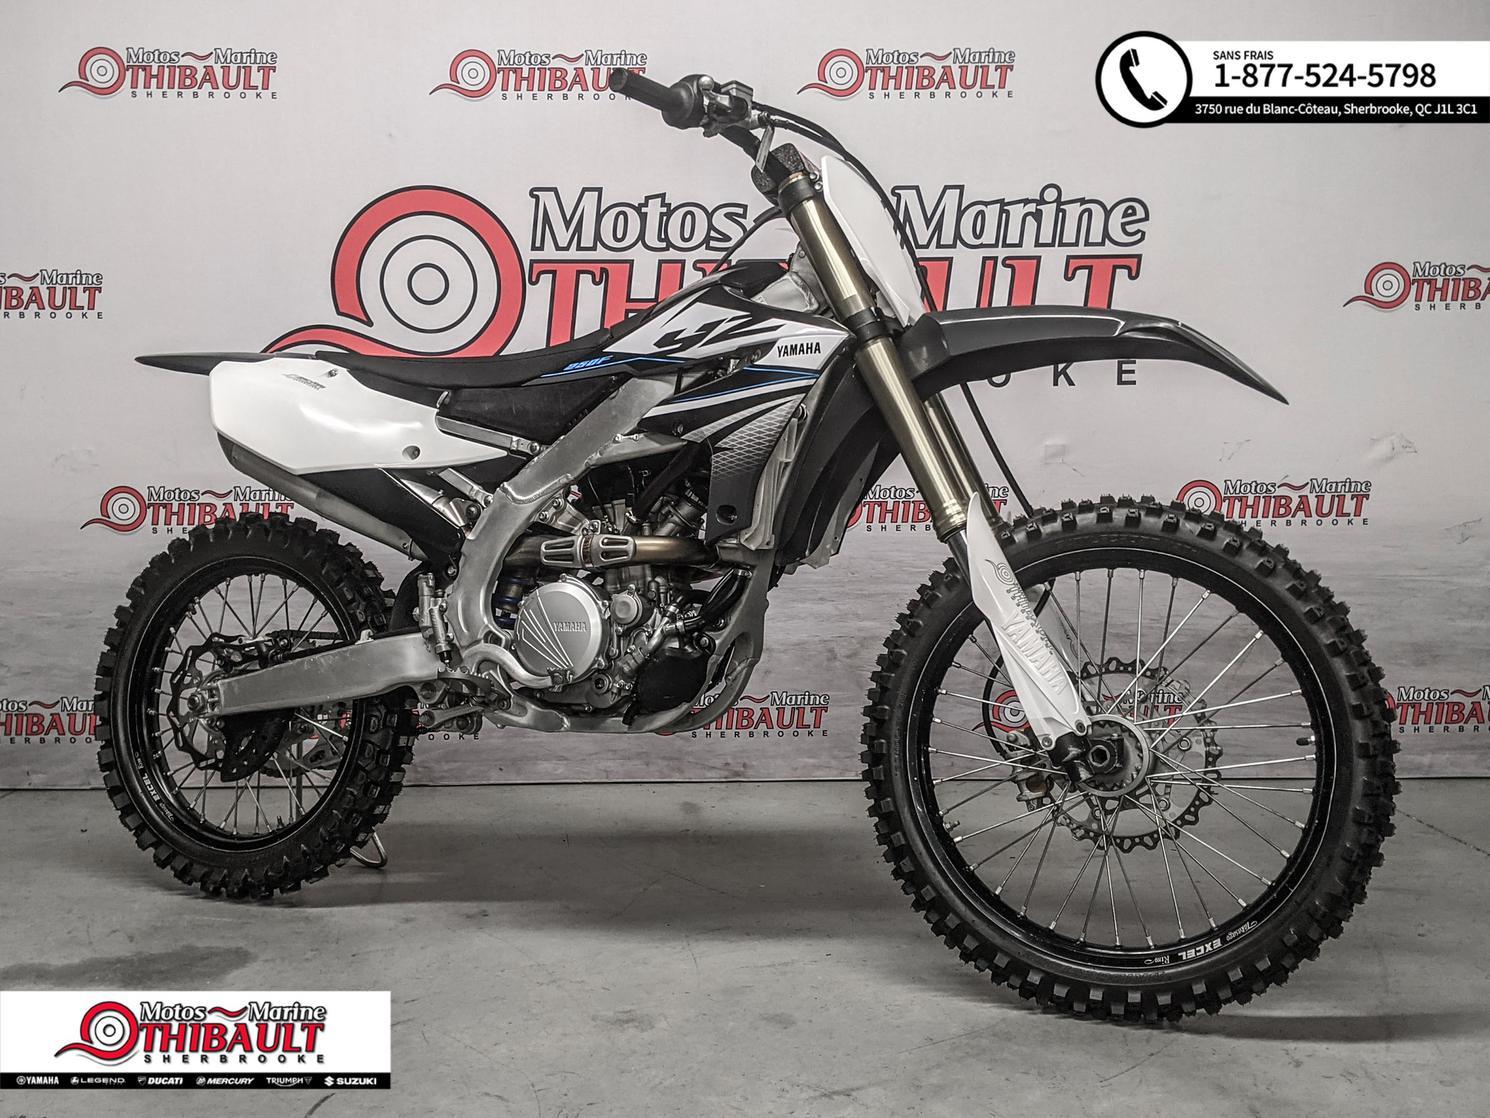 2020 Yamaha YZ250F Motocross Yamaha YZ 250 F